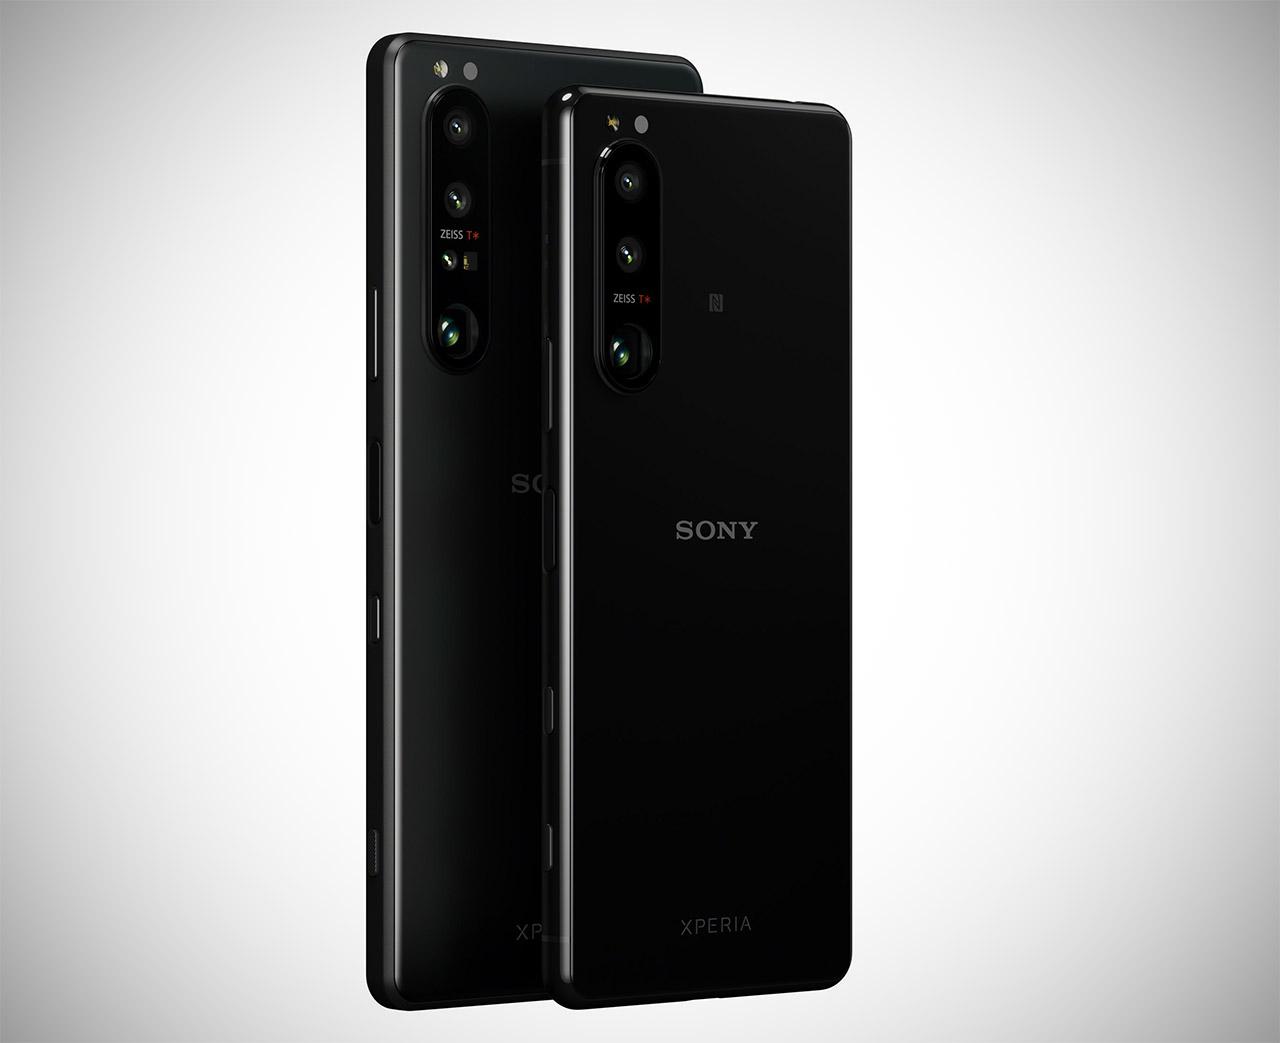 Sony Xperia 1 III Xperia 5 III Smartphones